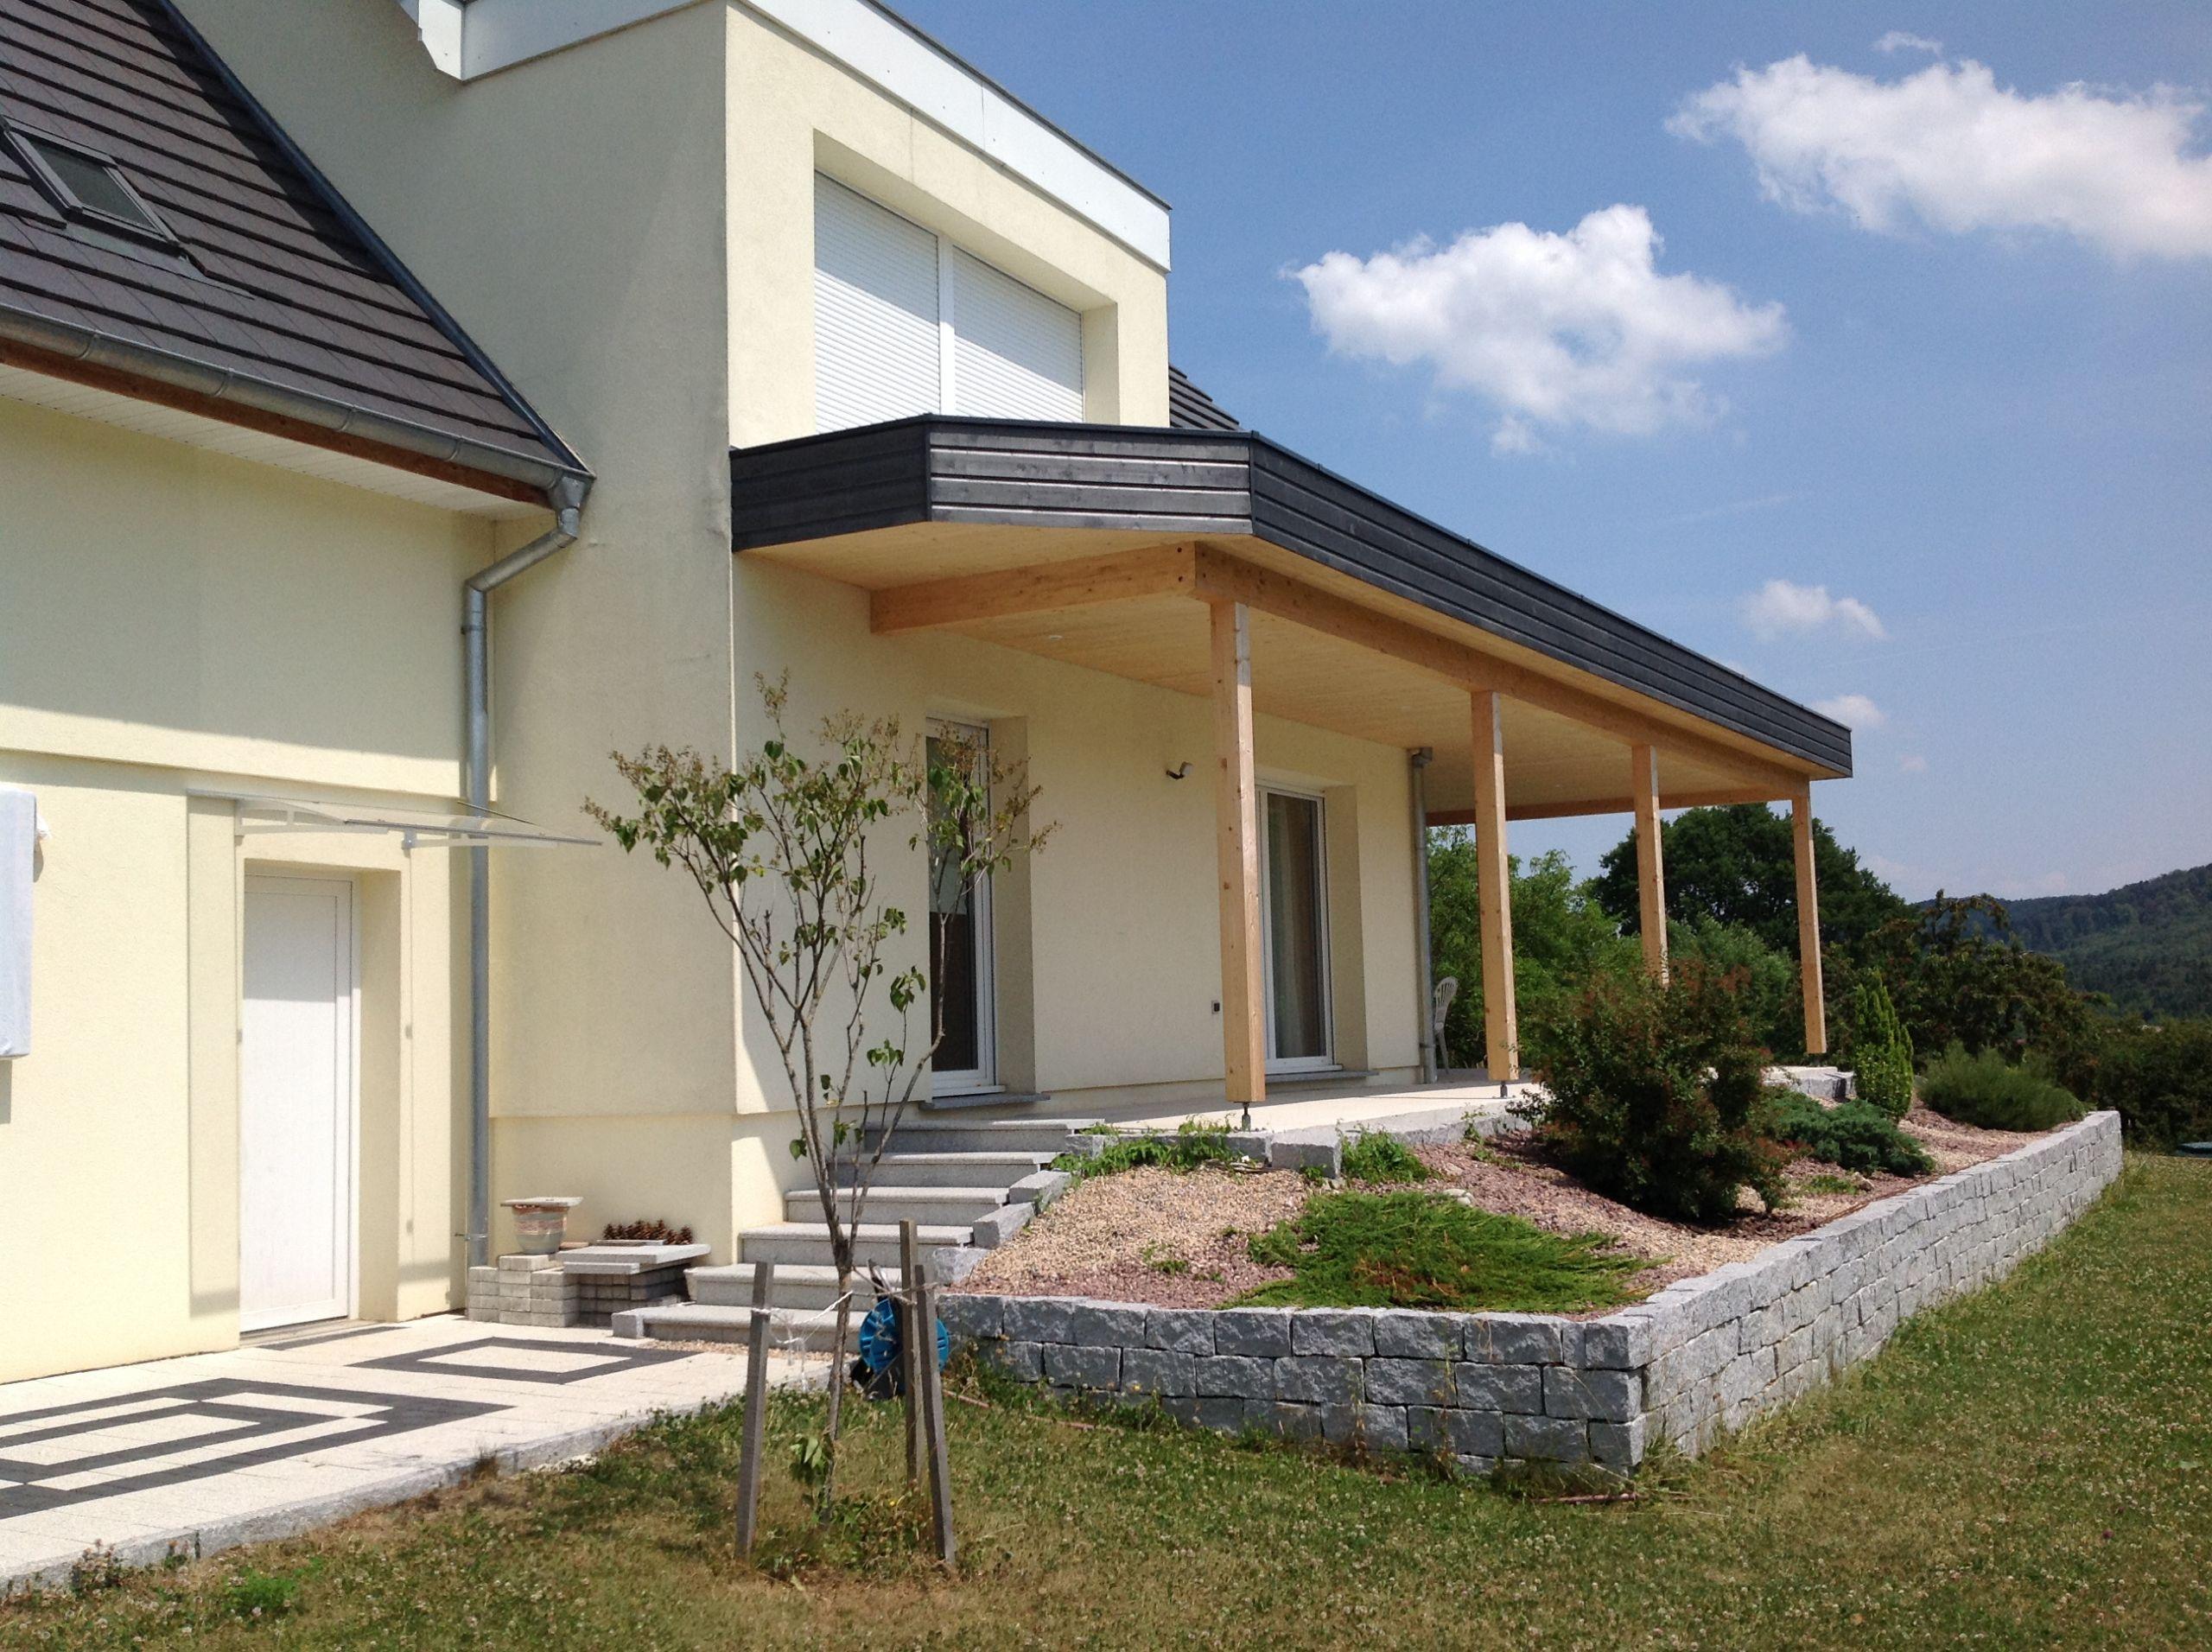 Extension Maison Terrasse Couverte terrasse couverte toit plat extension maison garage en bois